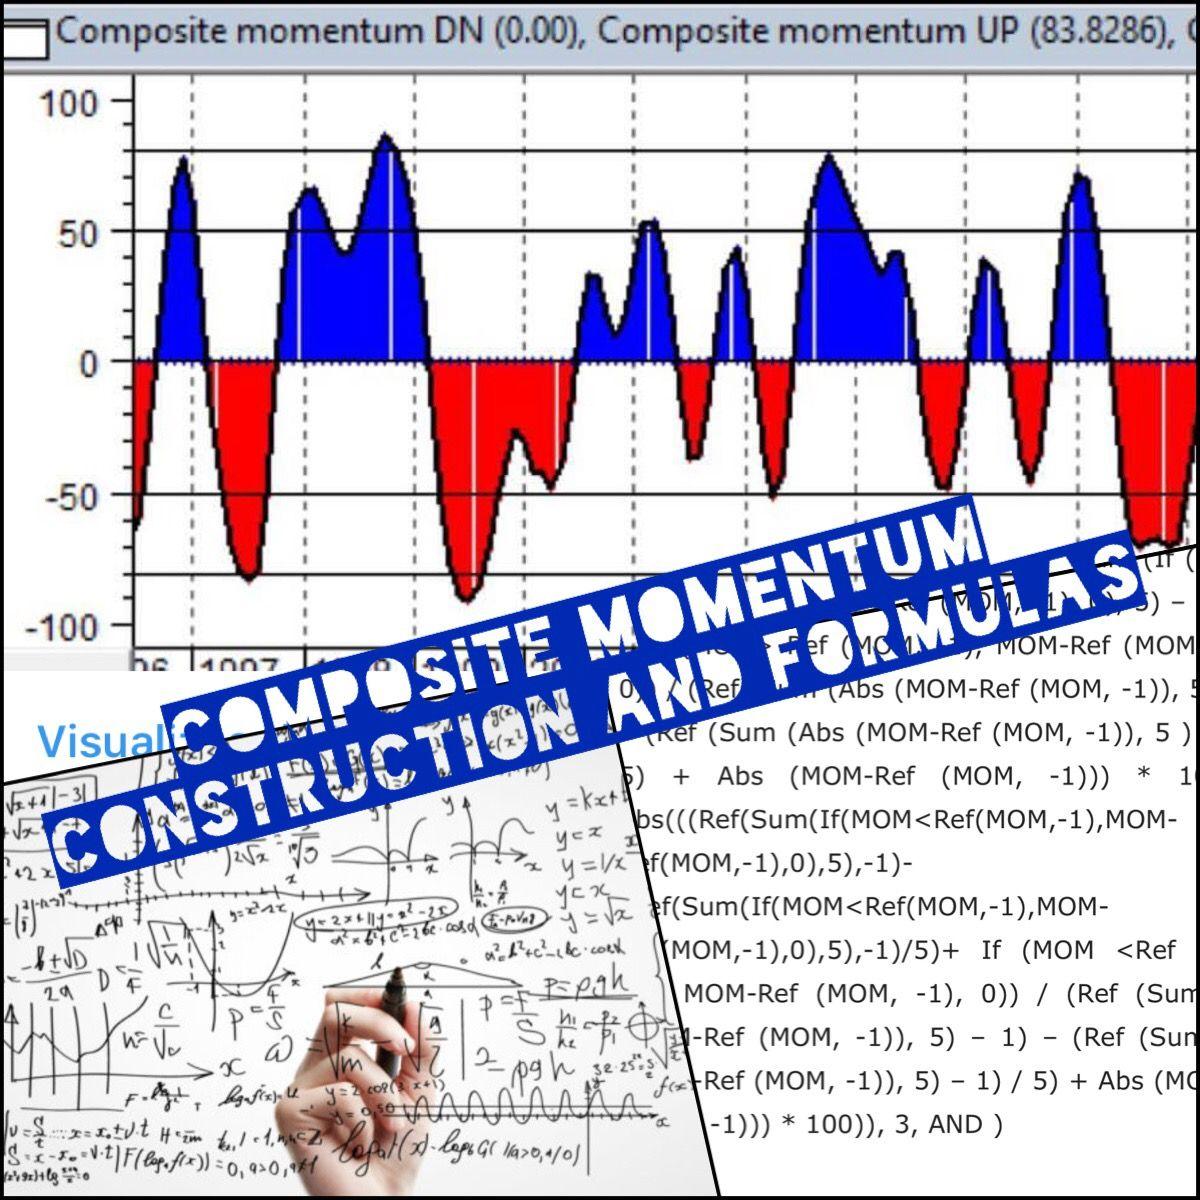 Compositemomentum Index Bloomberg Francescocaruso